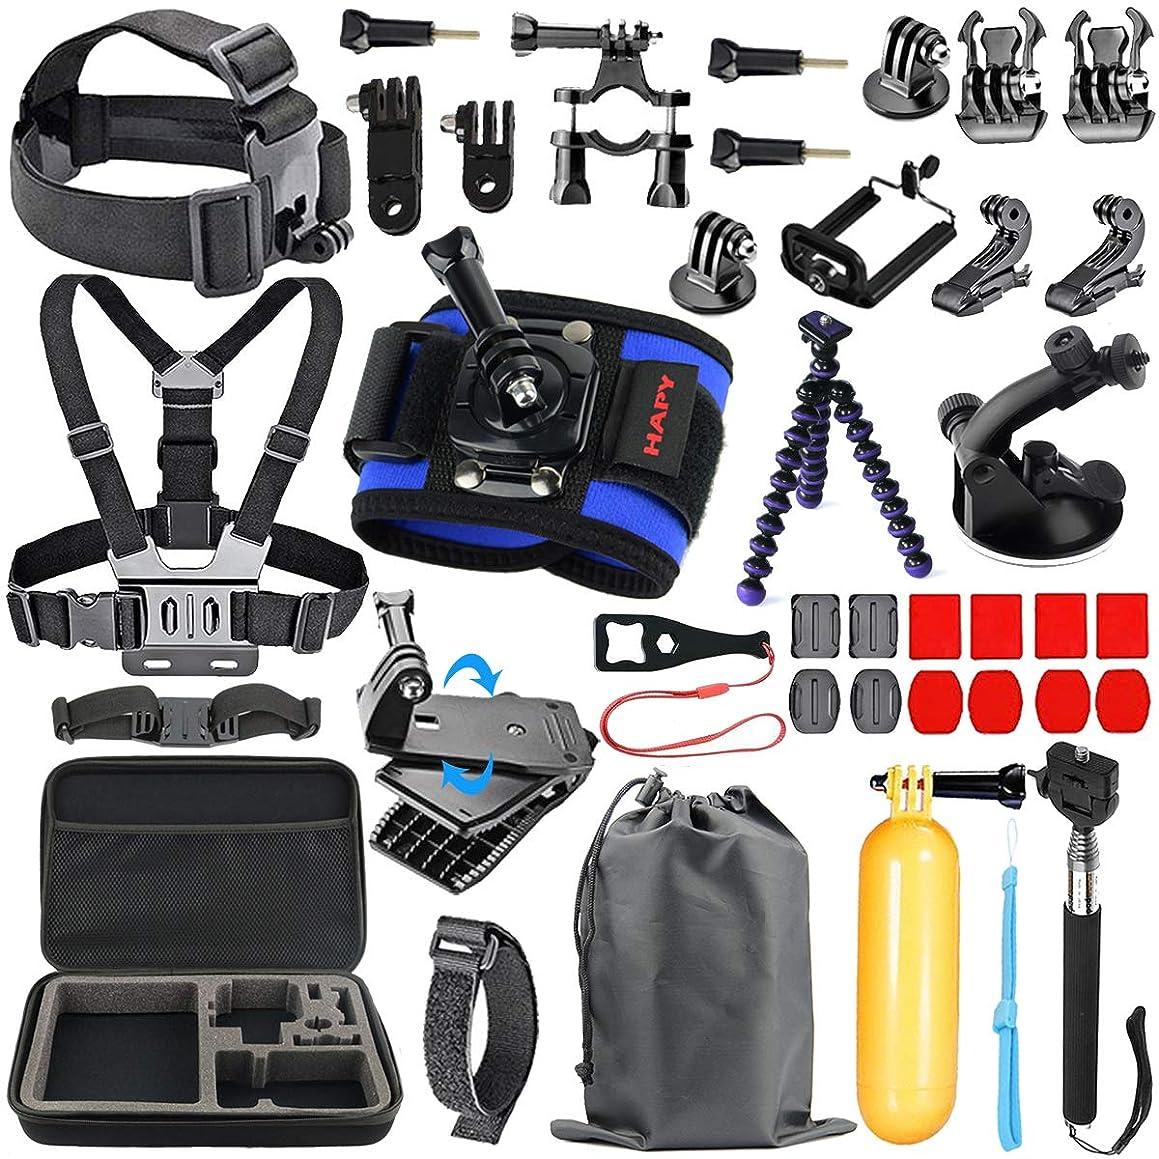 HAPY Sports Action Professional Video Camera Accessory Kit for GoPro Hero6,5 Black, Hero Session,Hero (2018),Hero 7,6,5,4,3,3+, GoPro Fusion,SJCAM,AKASO,Xiaomi,DBPOWER,Camera Kit